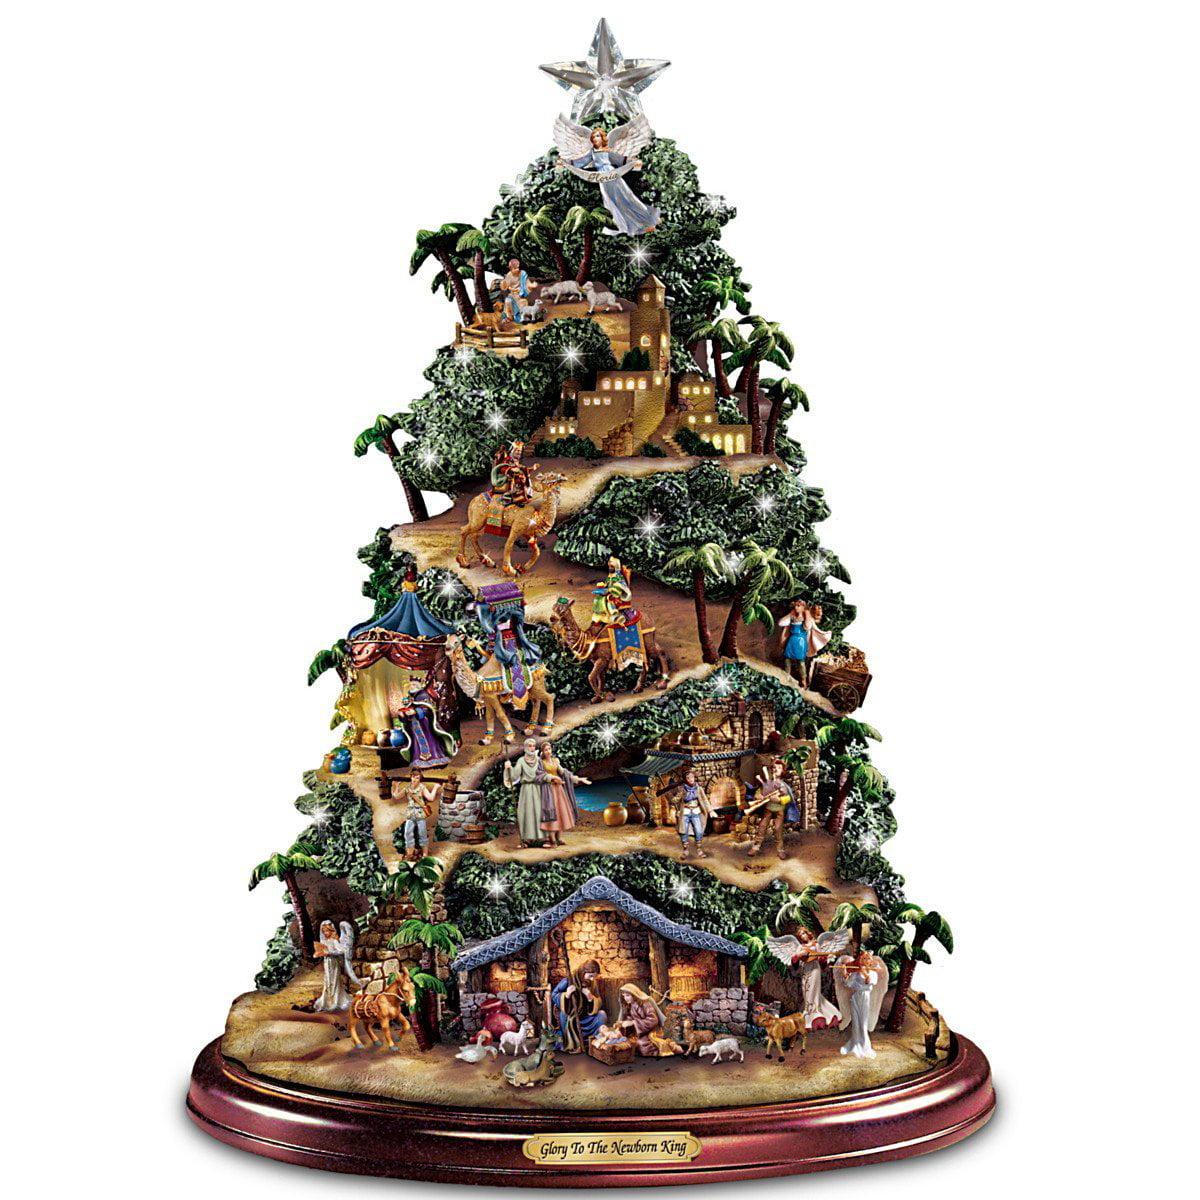 Kinkade christmas ornaments - Thomas Kinkade Illuminated Nativity Tabletop Tree Glory To The Newborn King By Hawthorne Village Walmart Com